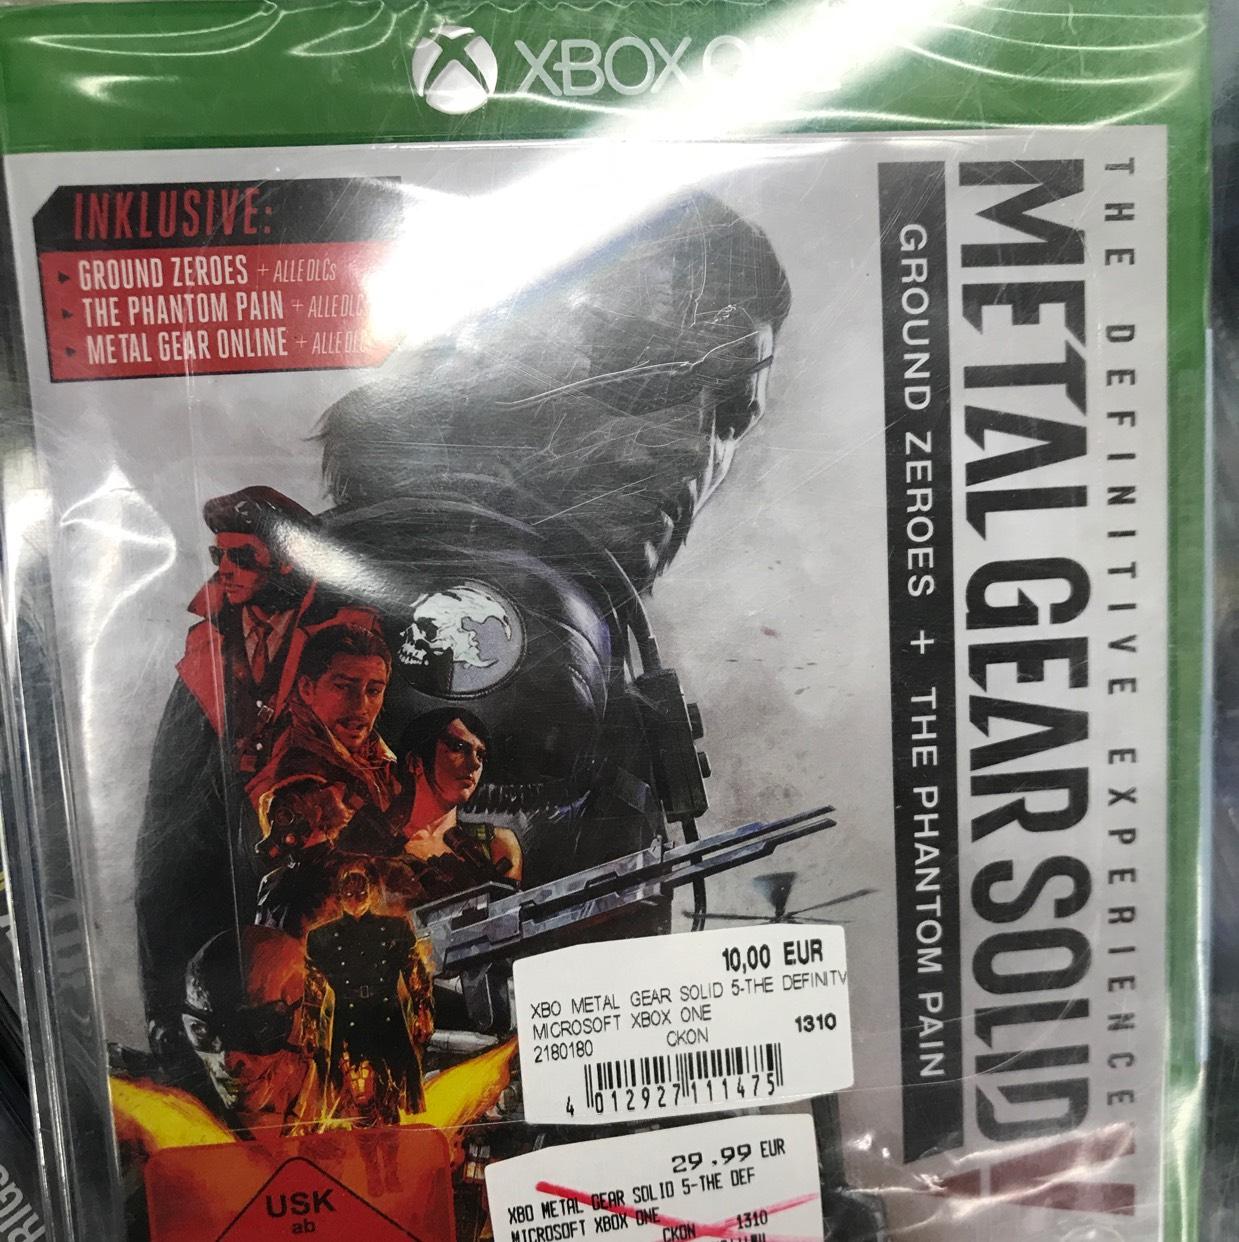 [Lokal Media Markt Berlin] Metal Gear Solid 5 - The Definitive Edition (Xbox one) für 10 €